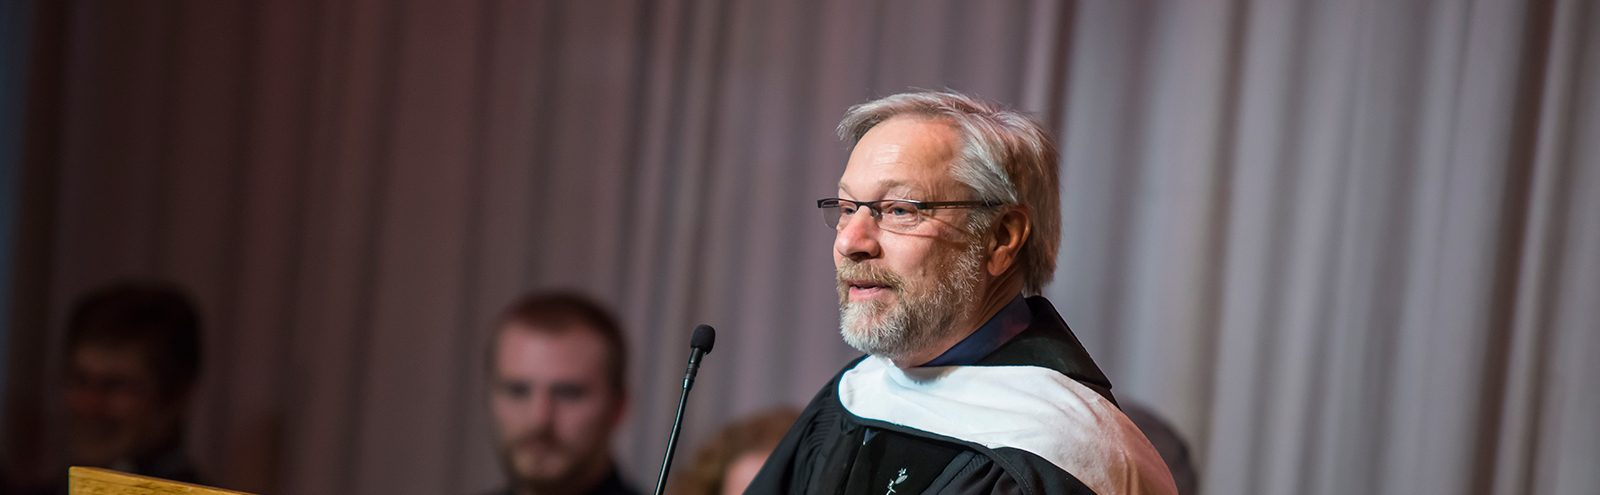 Chaplain David Saetre at podium